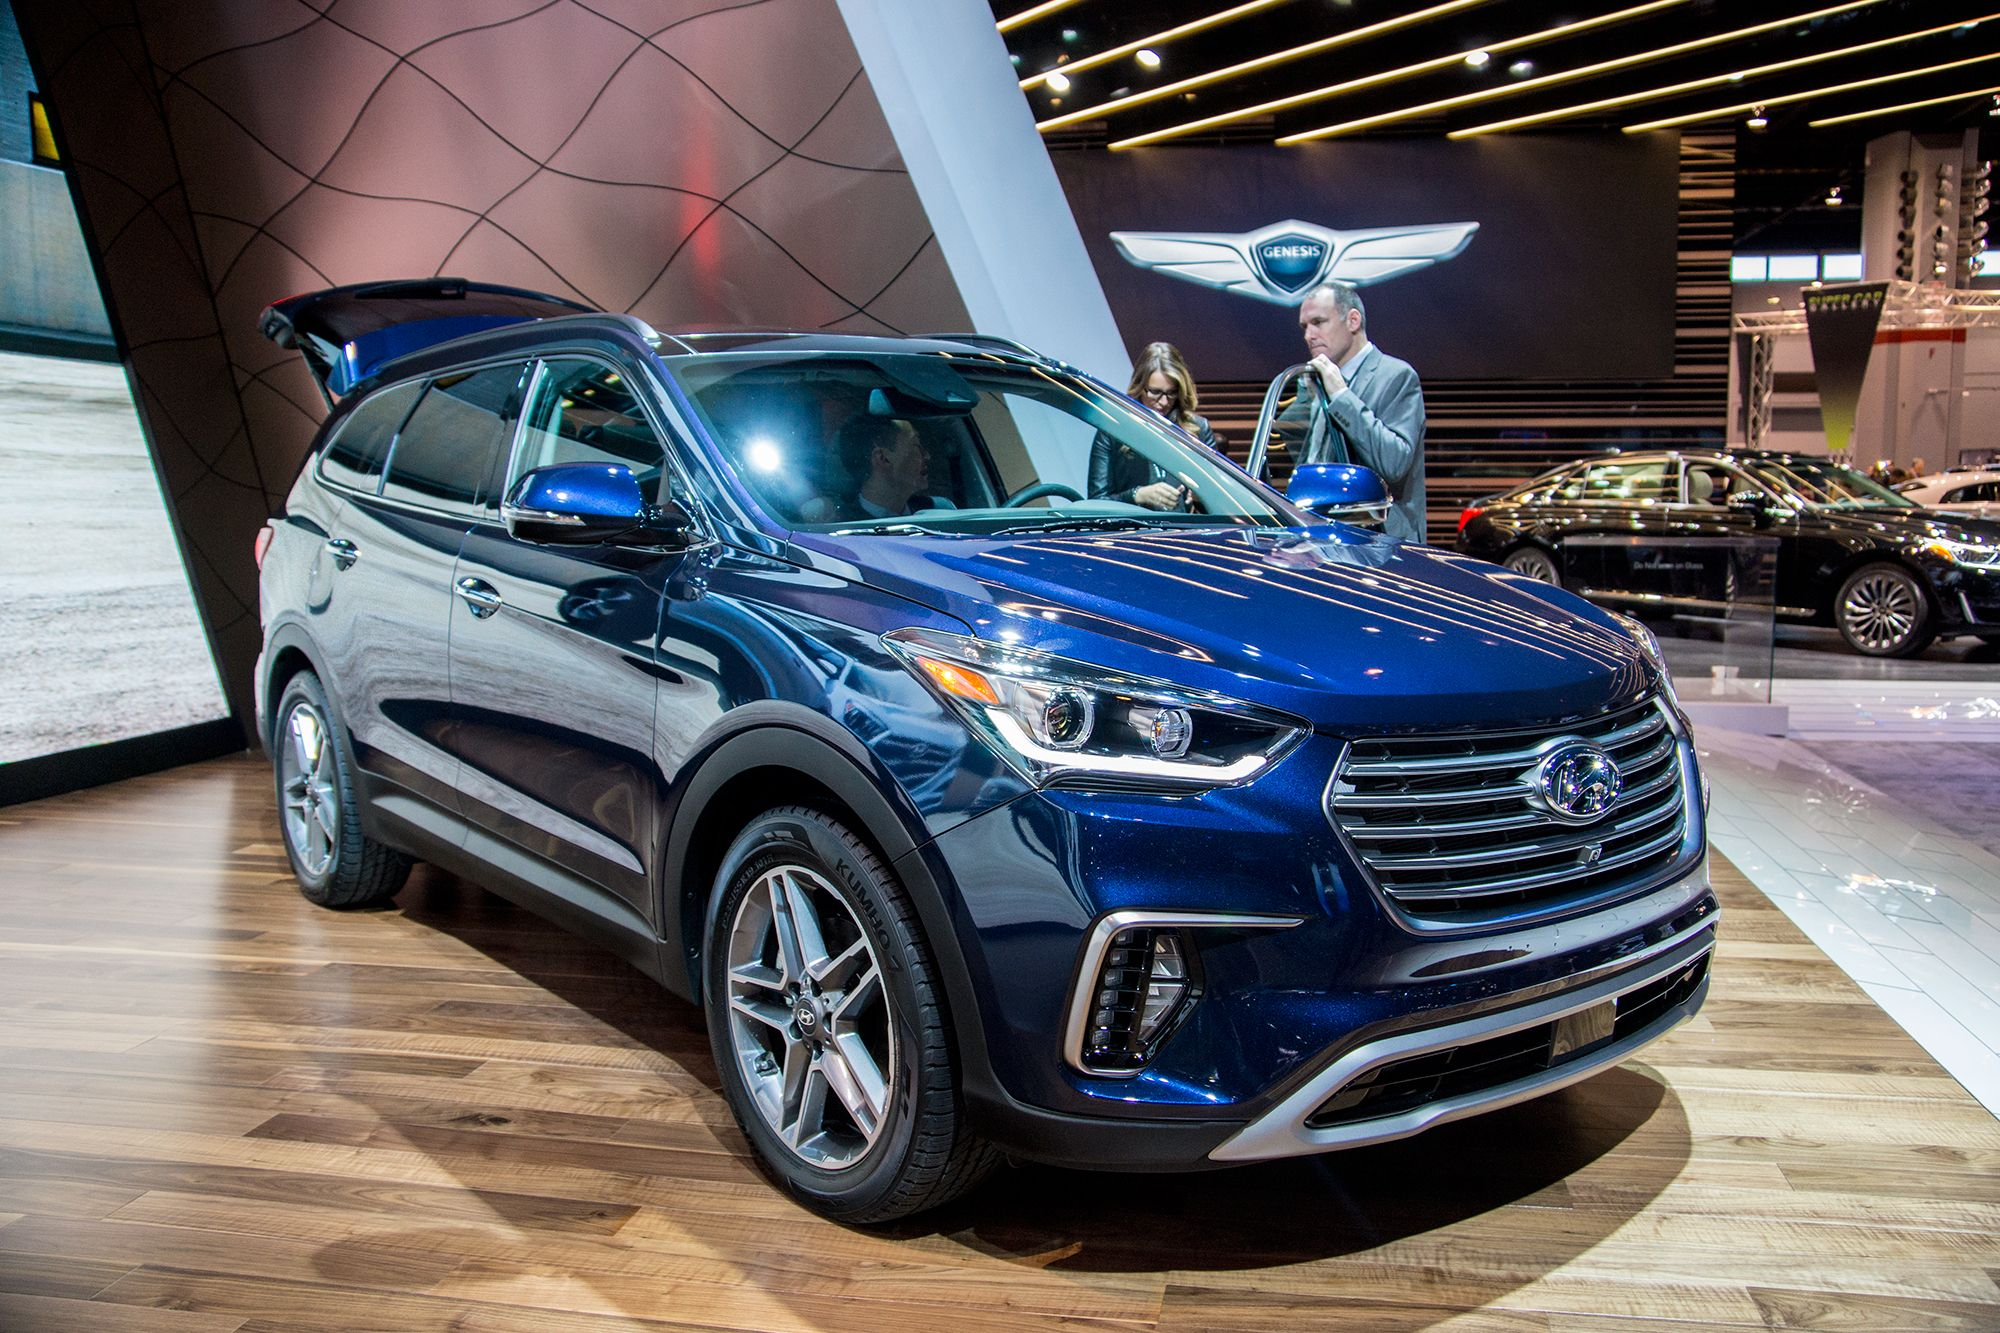 Style Utility And Uniqueness Combine To Make The 2018 Santa Fe The Best Yet Hyundai Dealership New Hyundai Hyundai